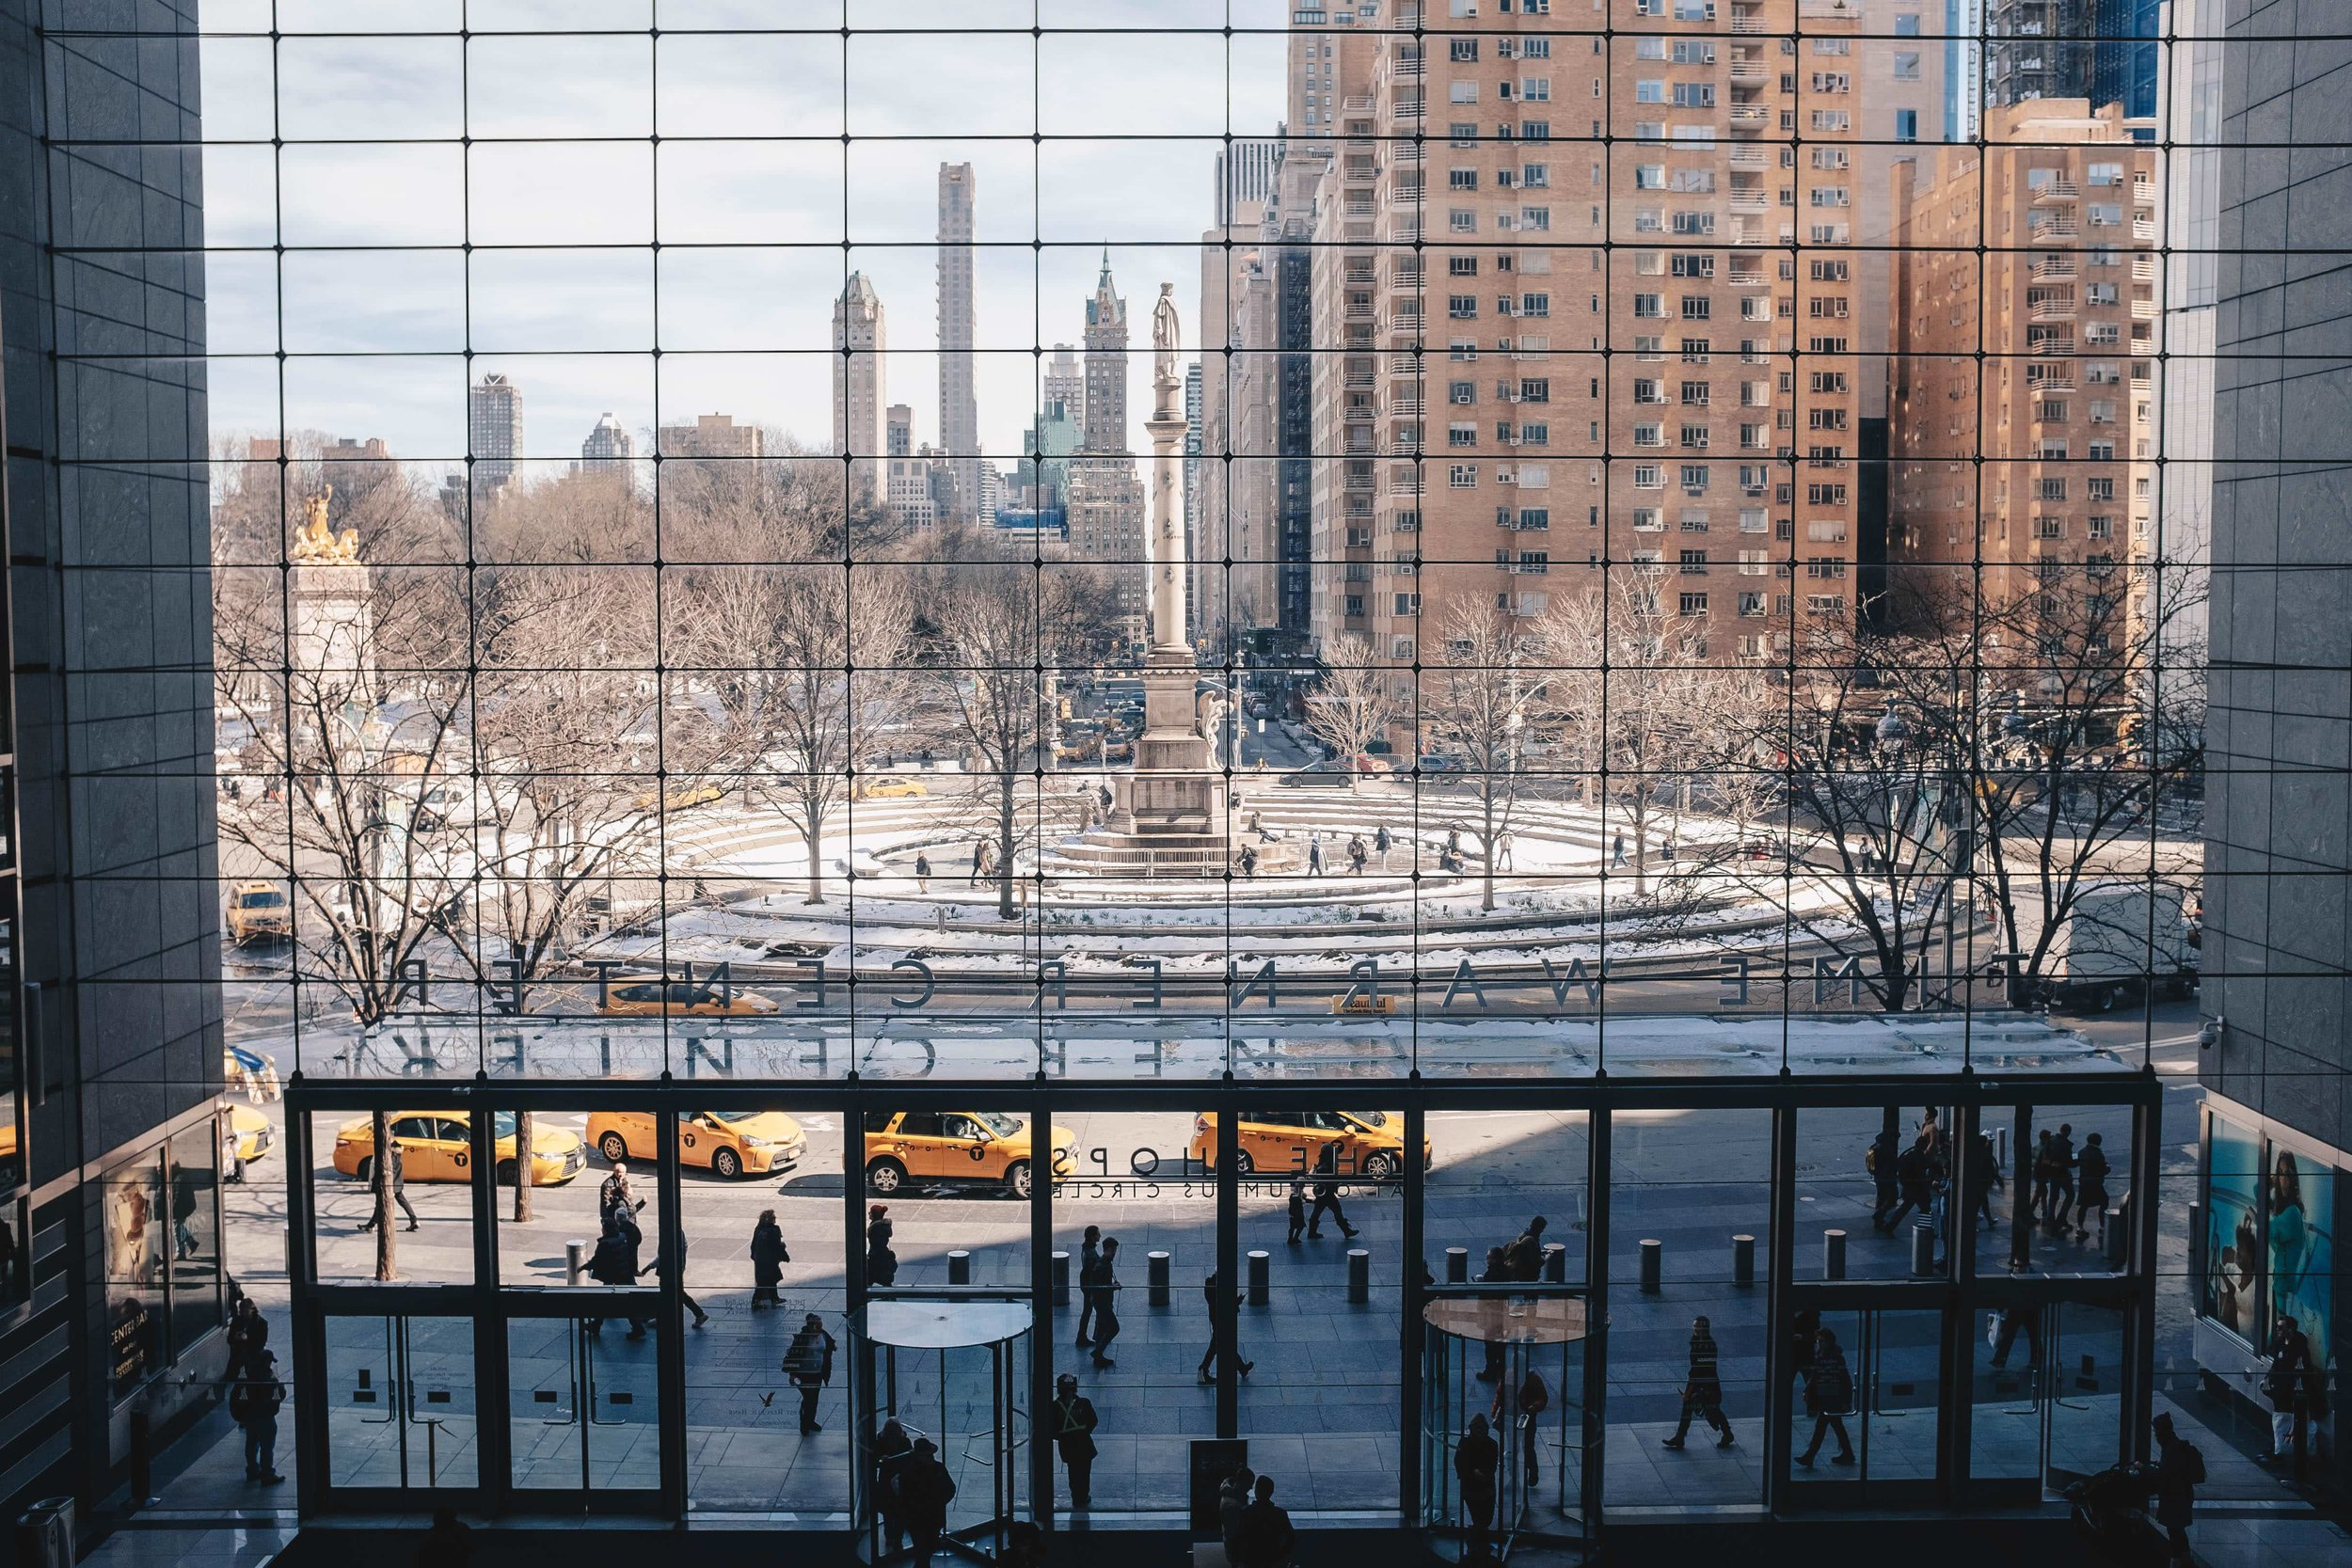 colombus-circle-mall-new-york-city.jpg